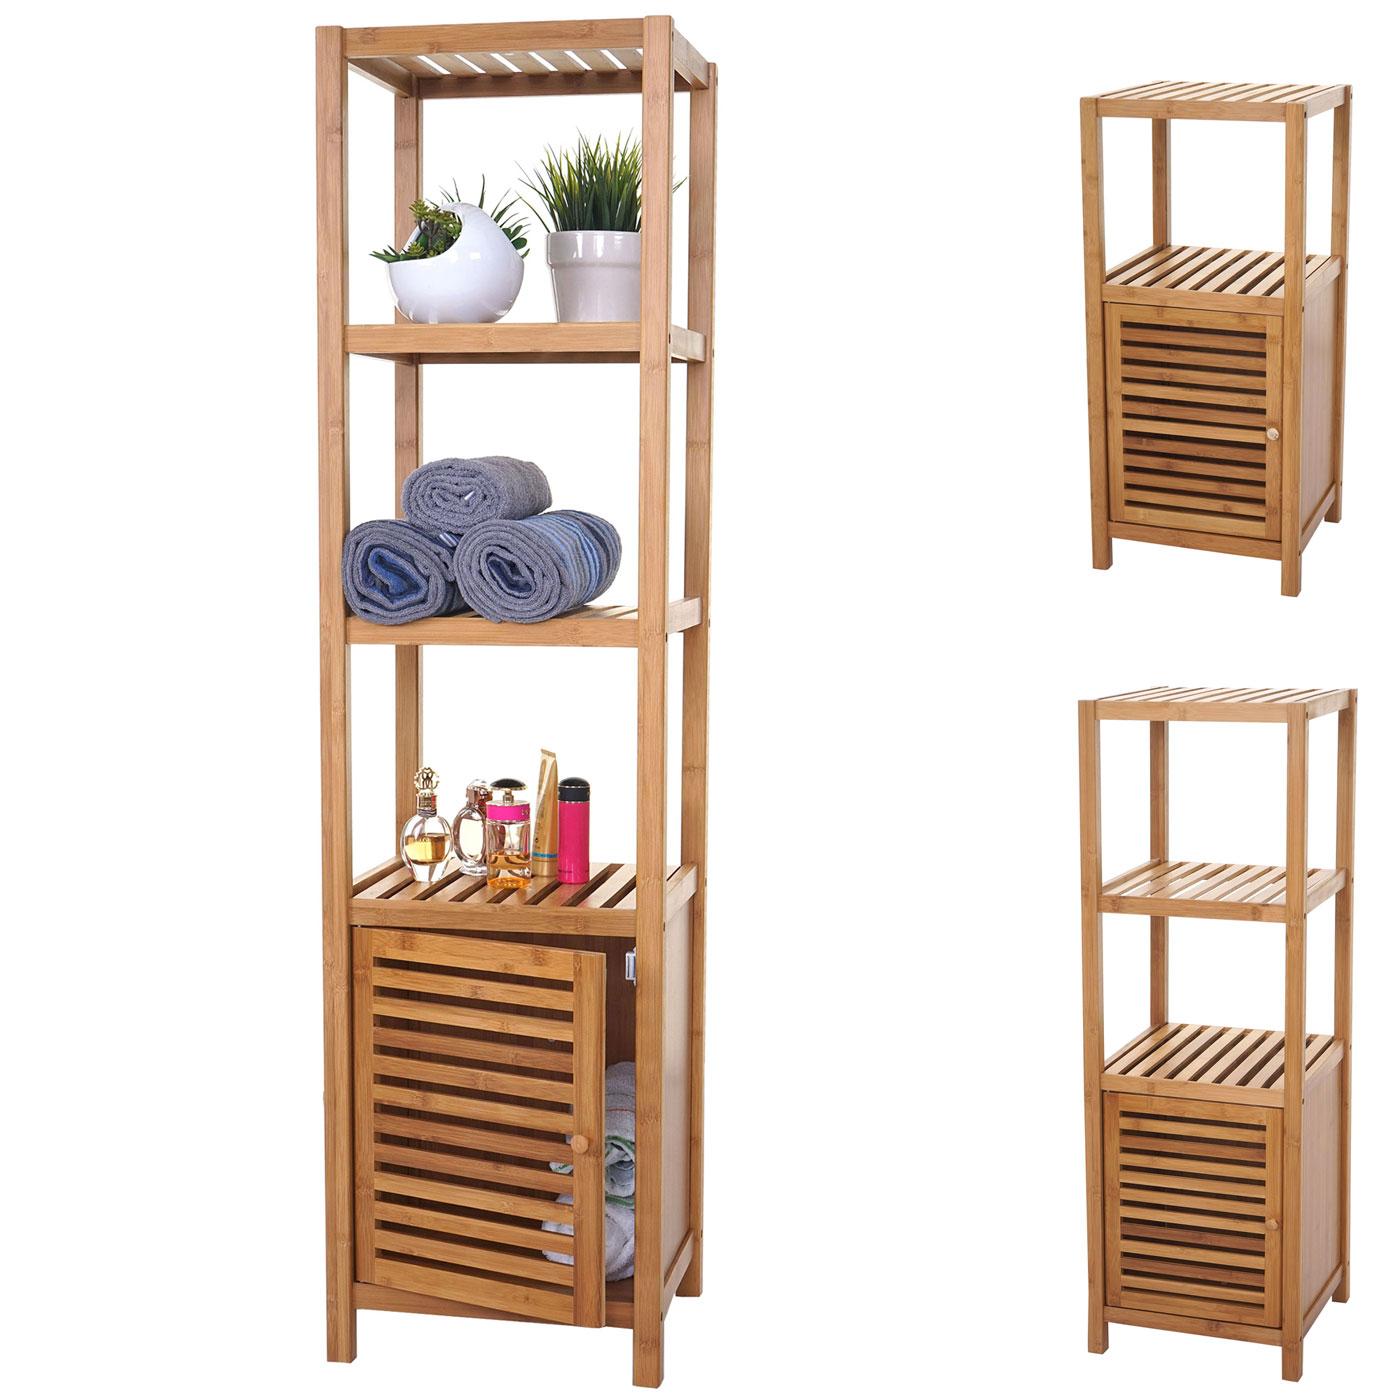 Mendler Badregal HWC-B18, Badezimmer Badschrank Standregal mit Tür, Bambus ~ Variantenangebot 57556